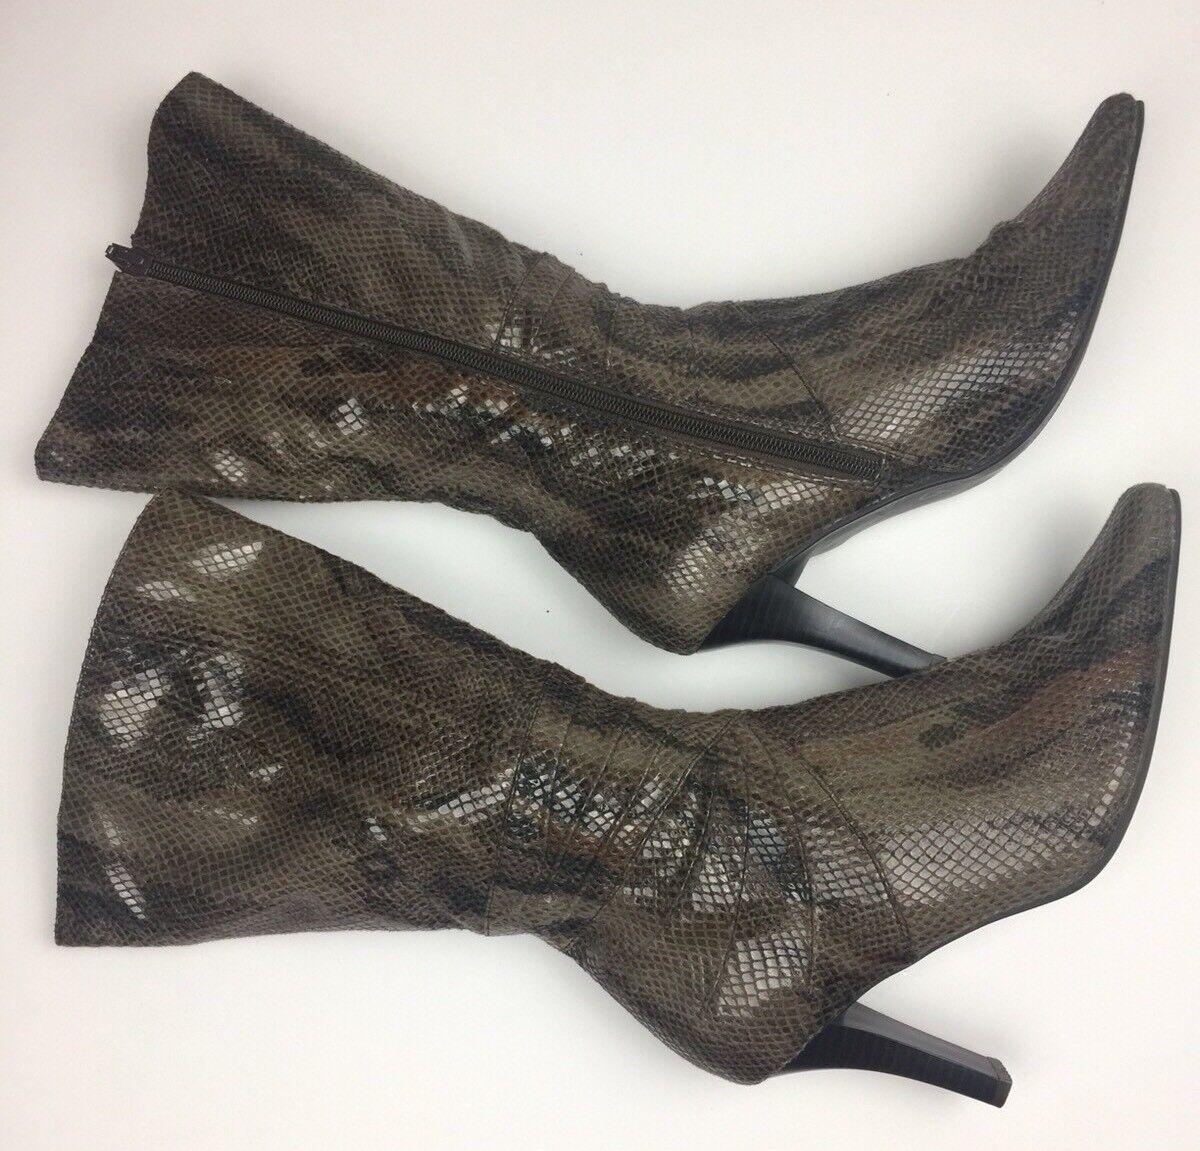 Apostrophe Womens Snake Print Boots Size 7 8225-IKR BROWN STILETTO